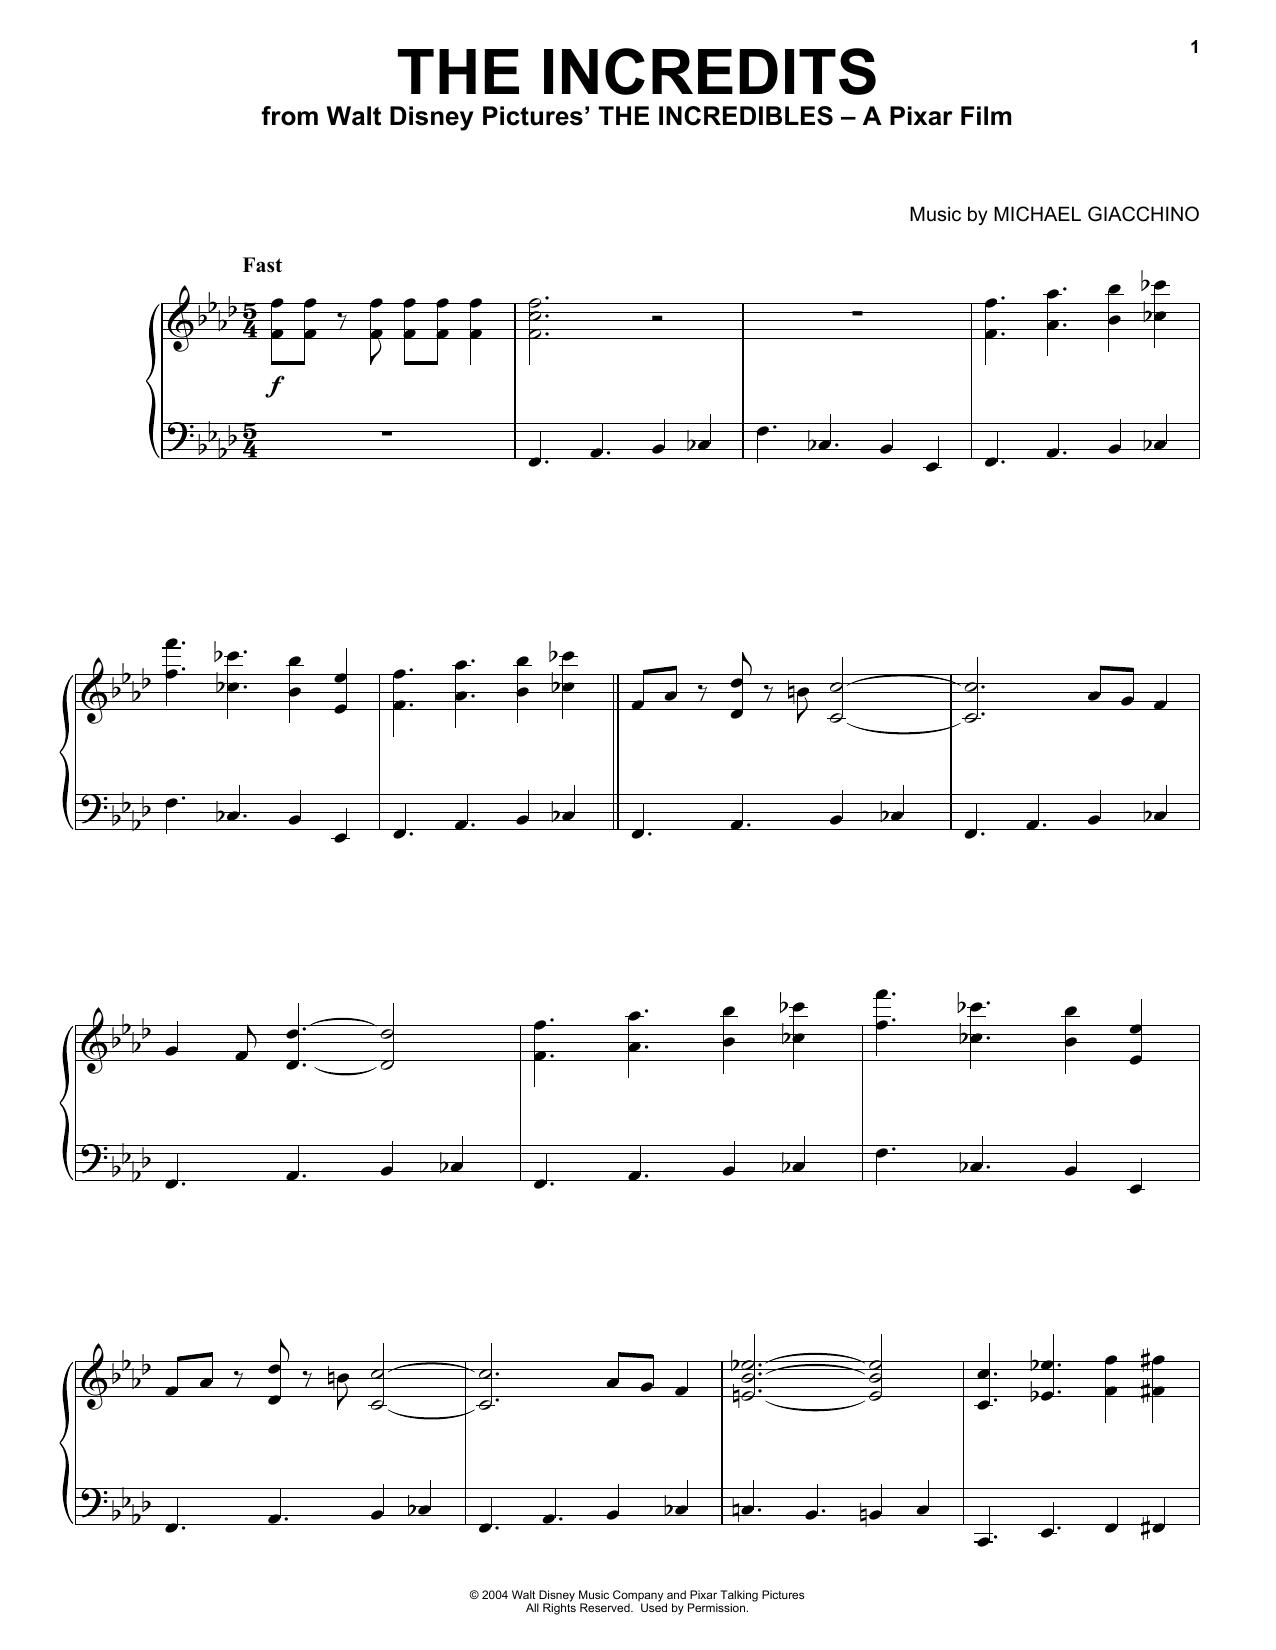 Michael Giacchino The Incredits sheet music notes and chords